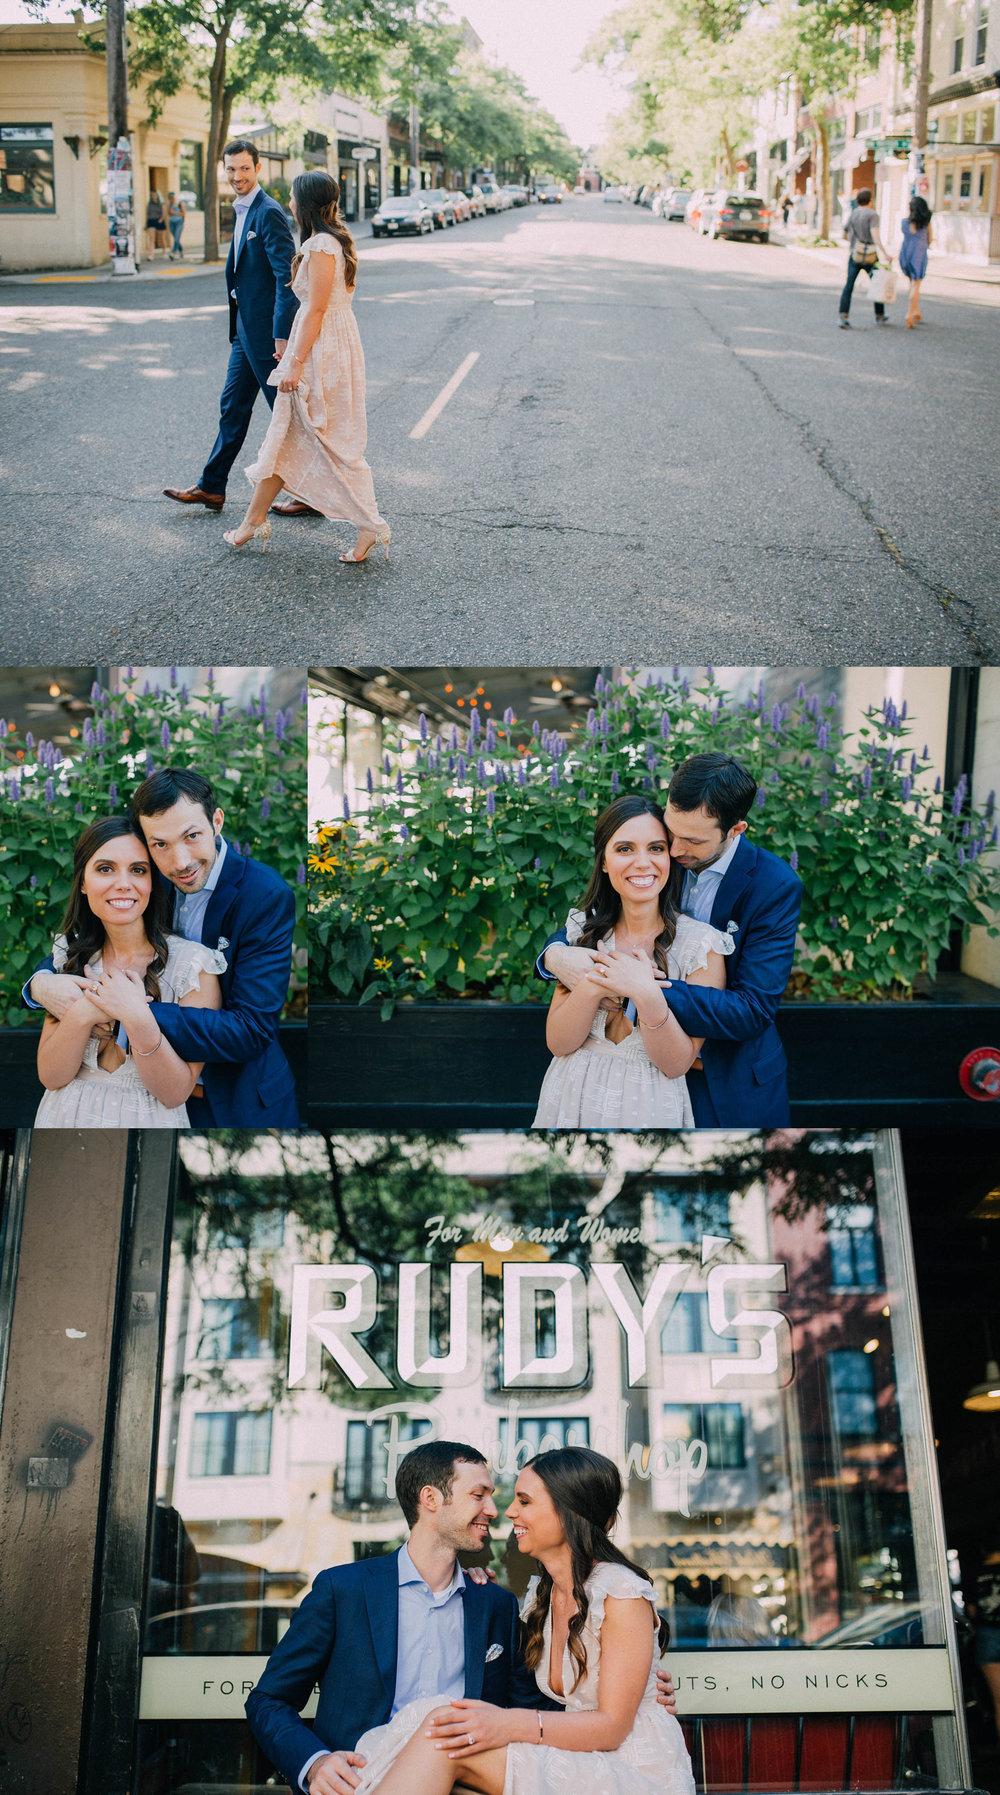 Seattle courthouse and wedding photographer ballard wedding ashley vos-19.jpg